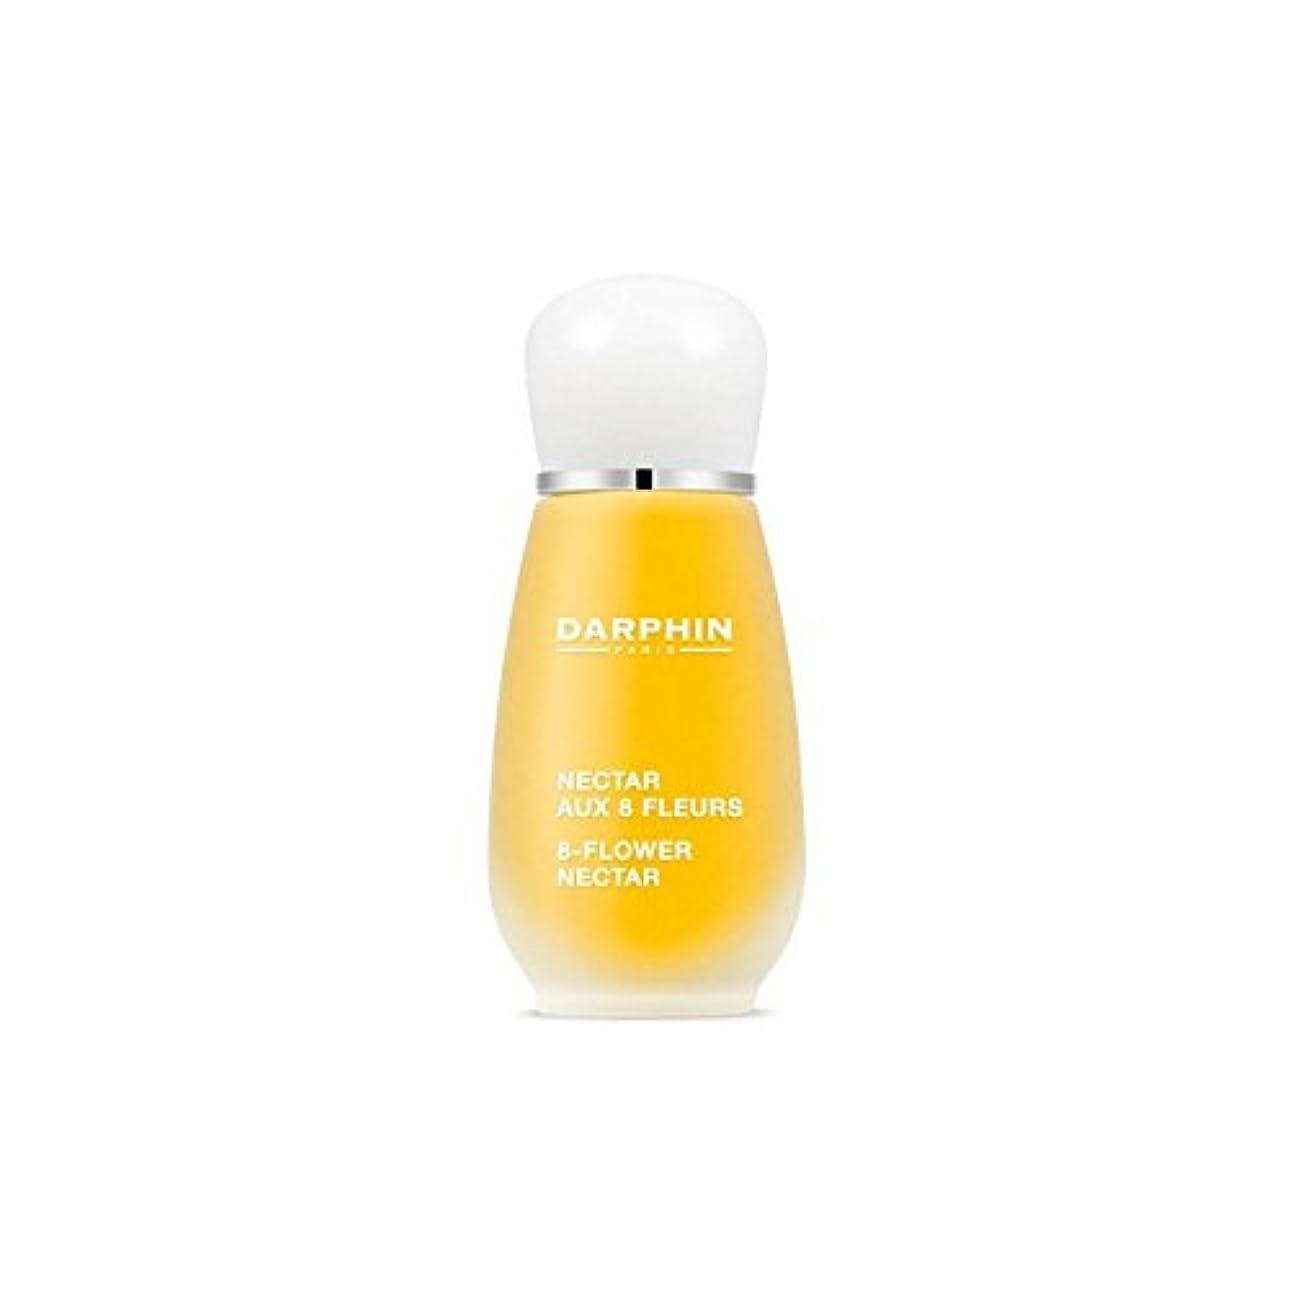 Darphin 8-Flower Nectar Aromatic Dry Oil (15ml) - 8の花の蜜をダルファン芳香乾性油(15ミリリットル) [並行輸入品]